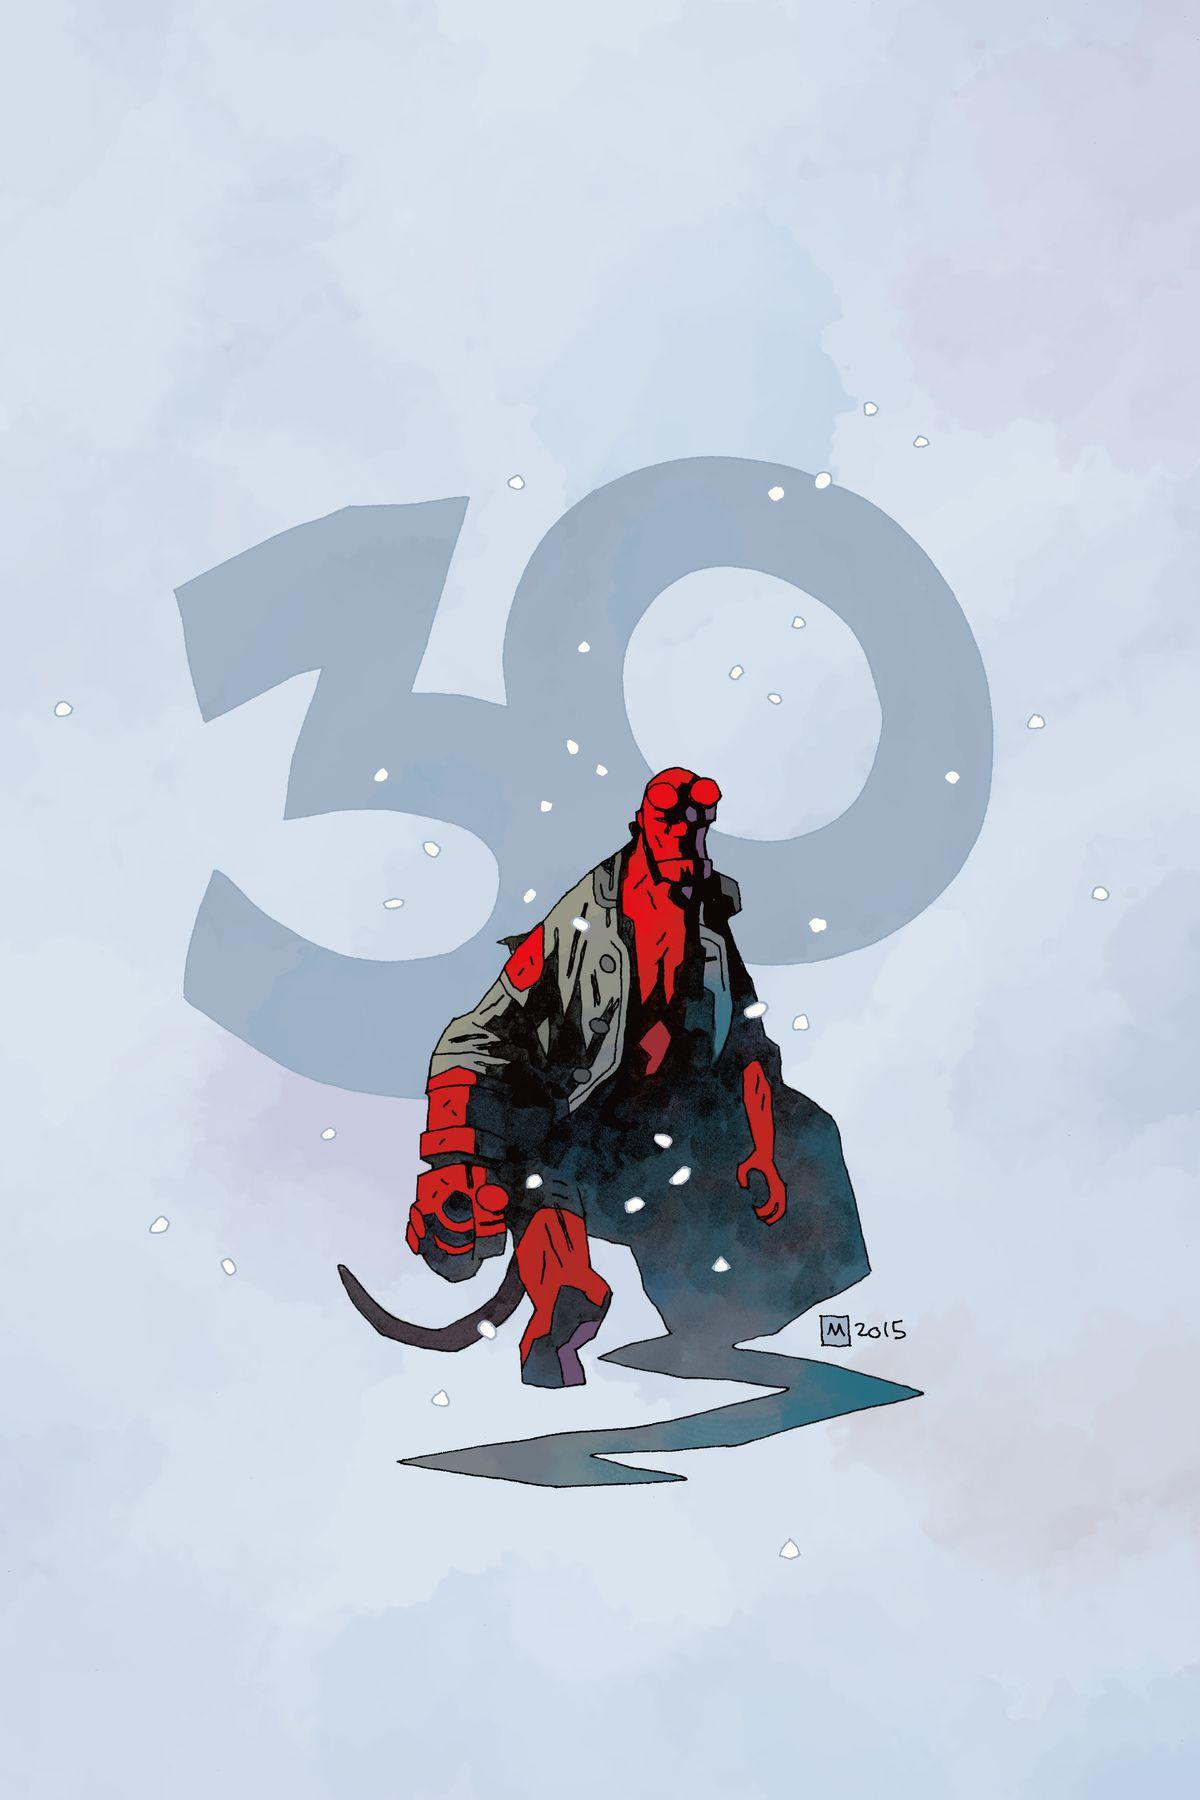 Hellboy Winter Special 2016 30th Anniversary, Dark Horse Comics (2016).